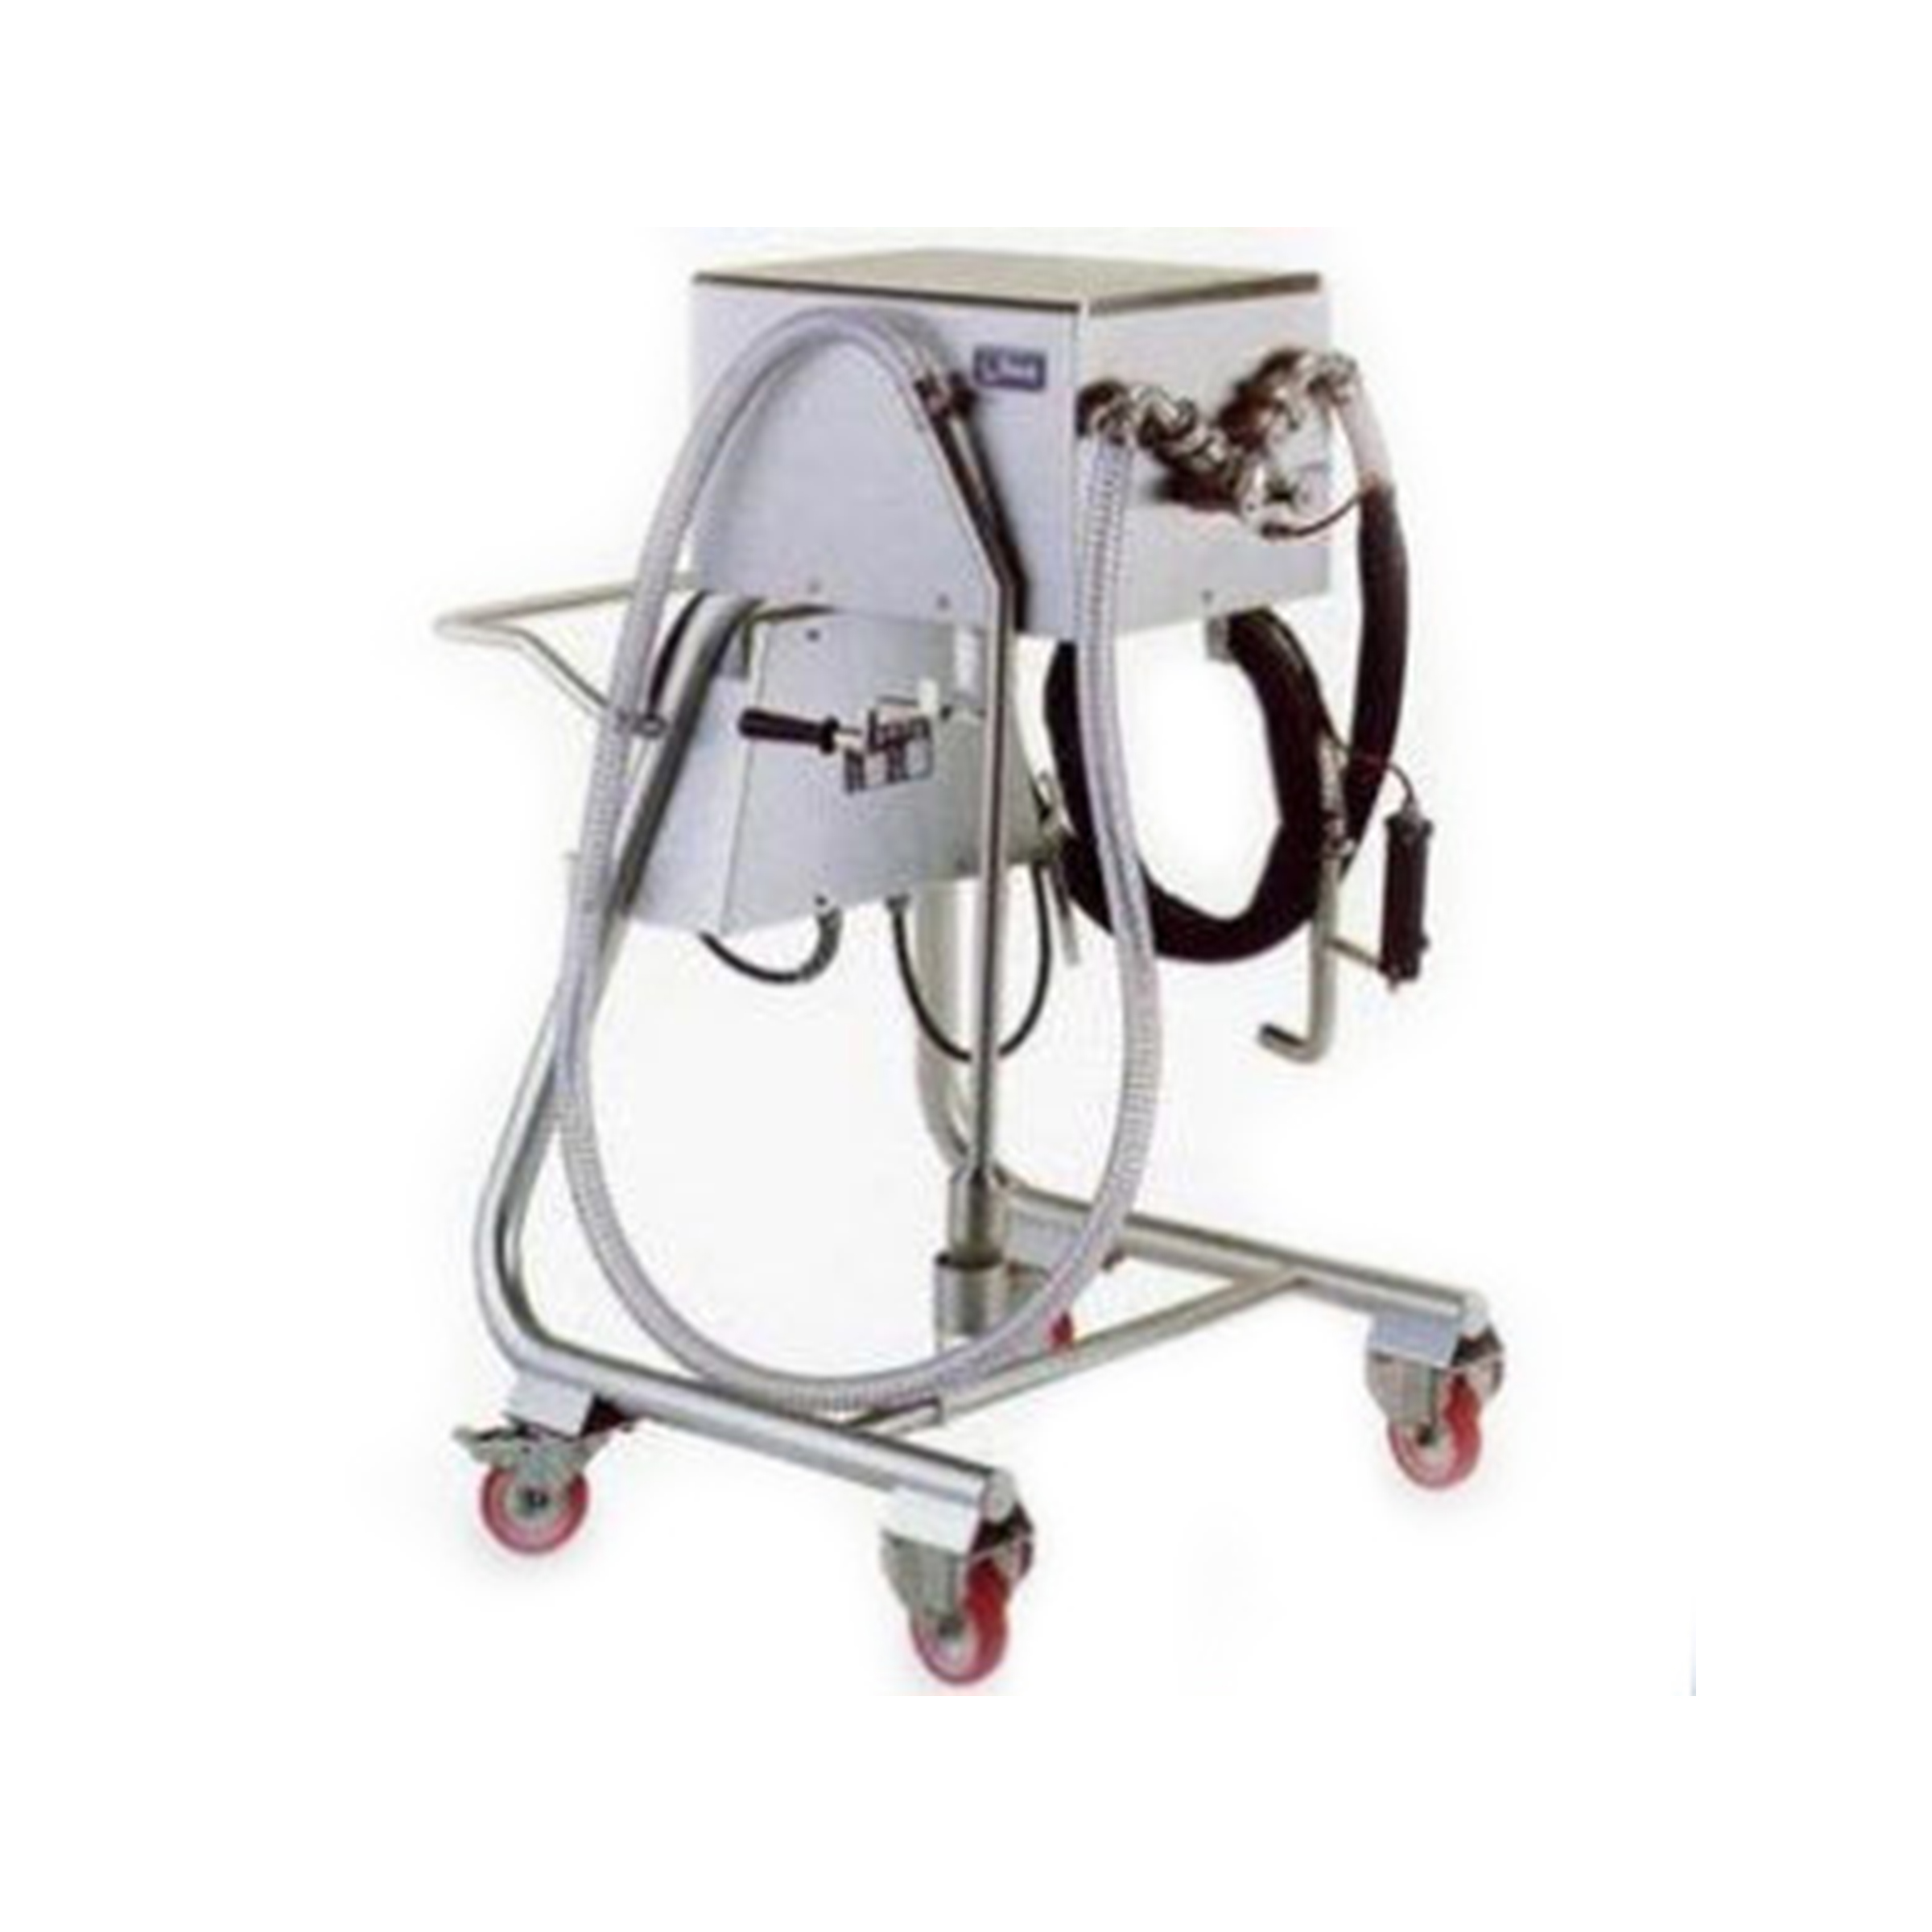 Soupper Transfer Pump.jpg